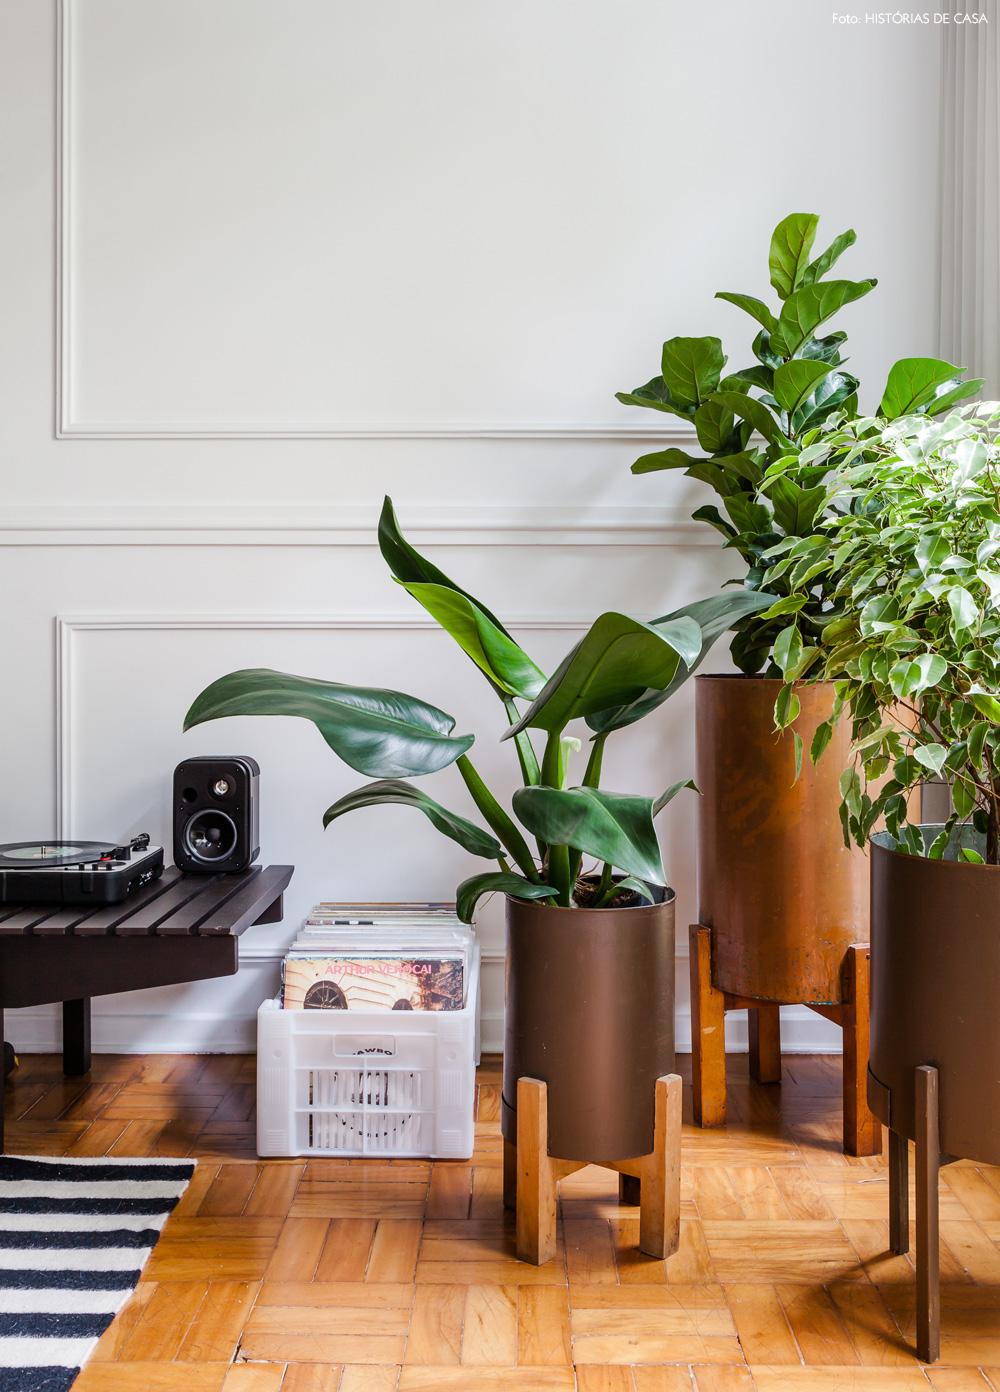 04-decoracao-sala-estar-plantas-suportes-boiserie-moderno